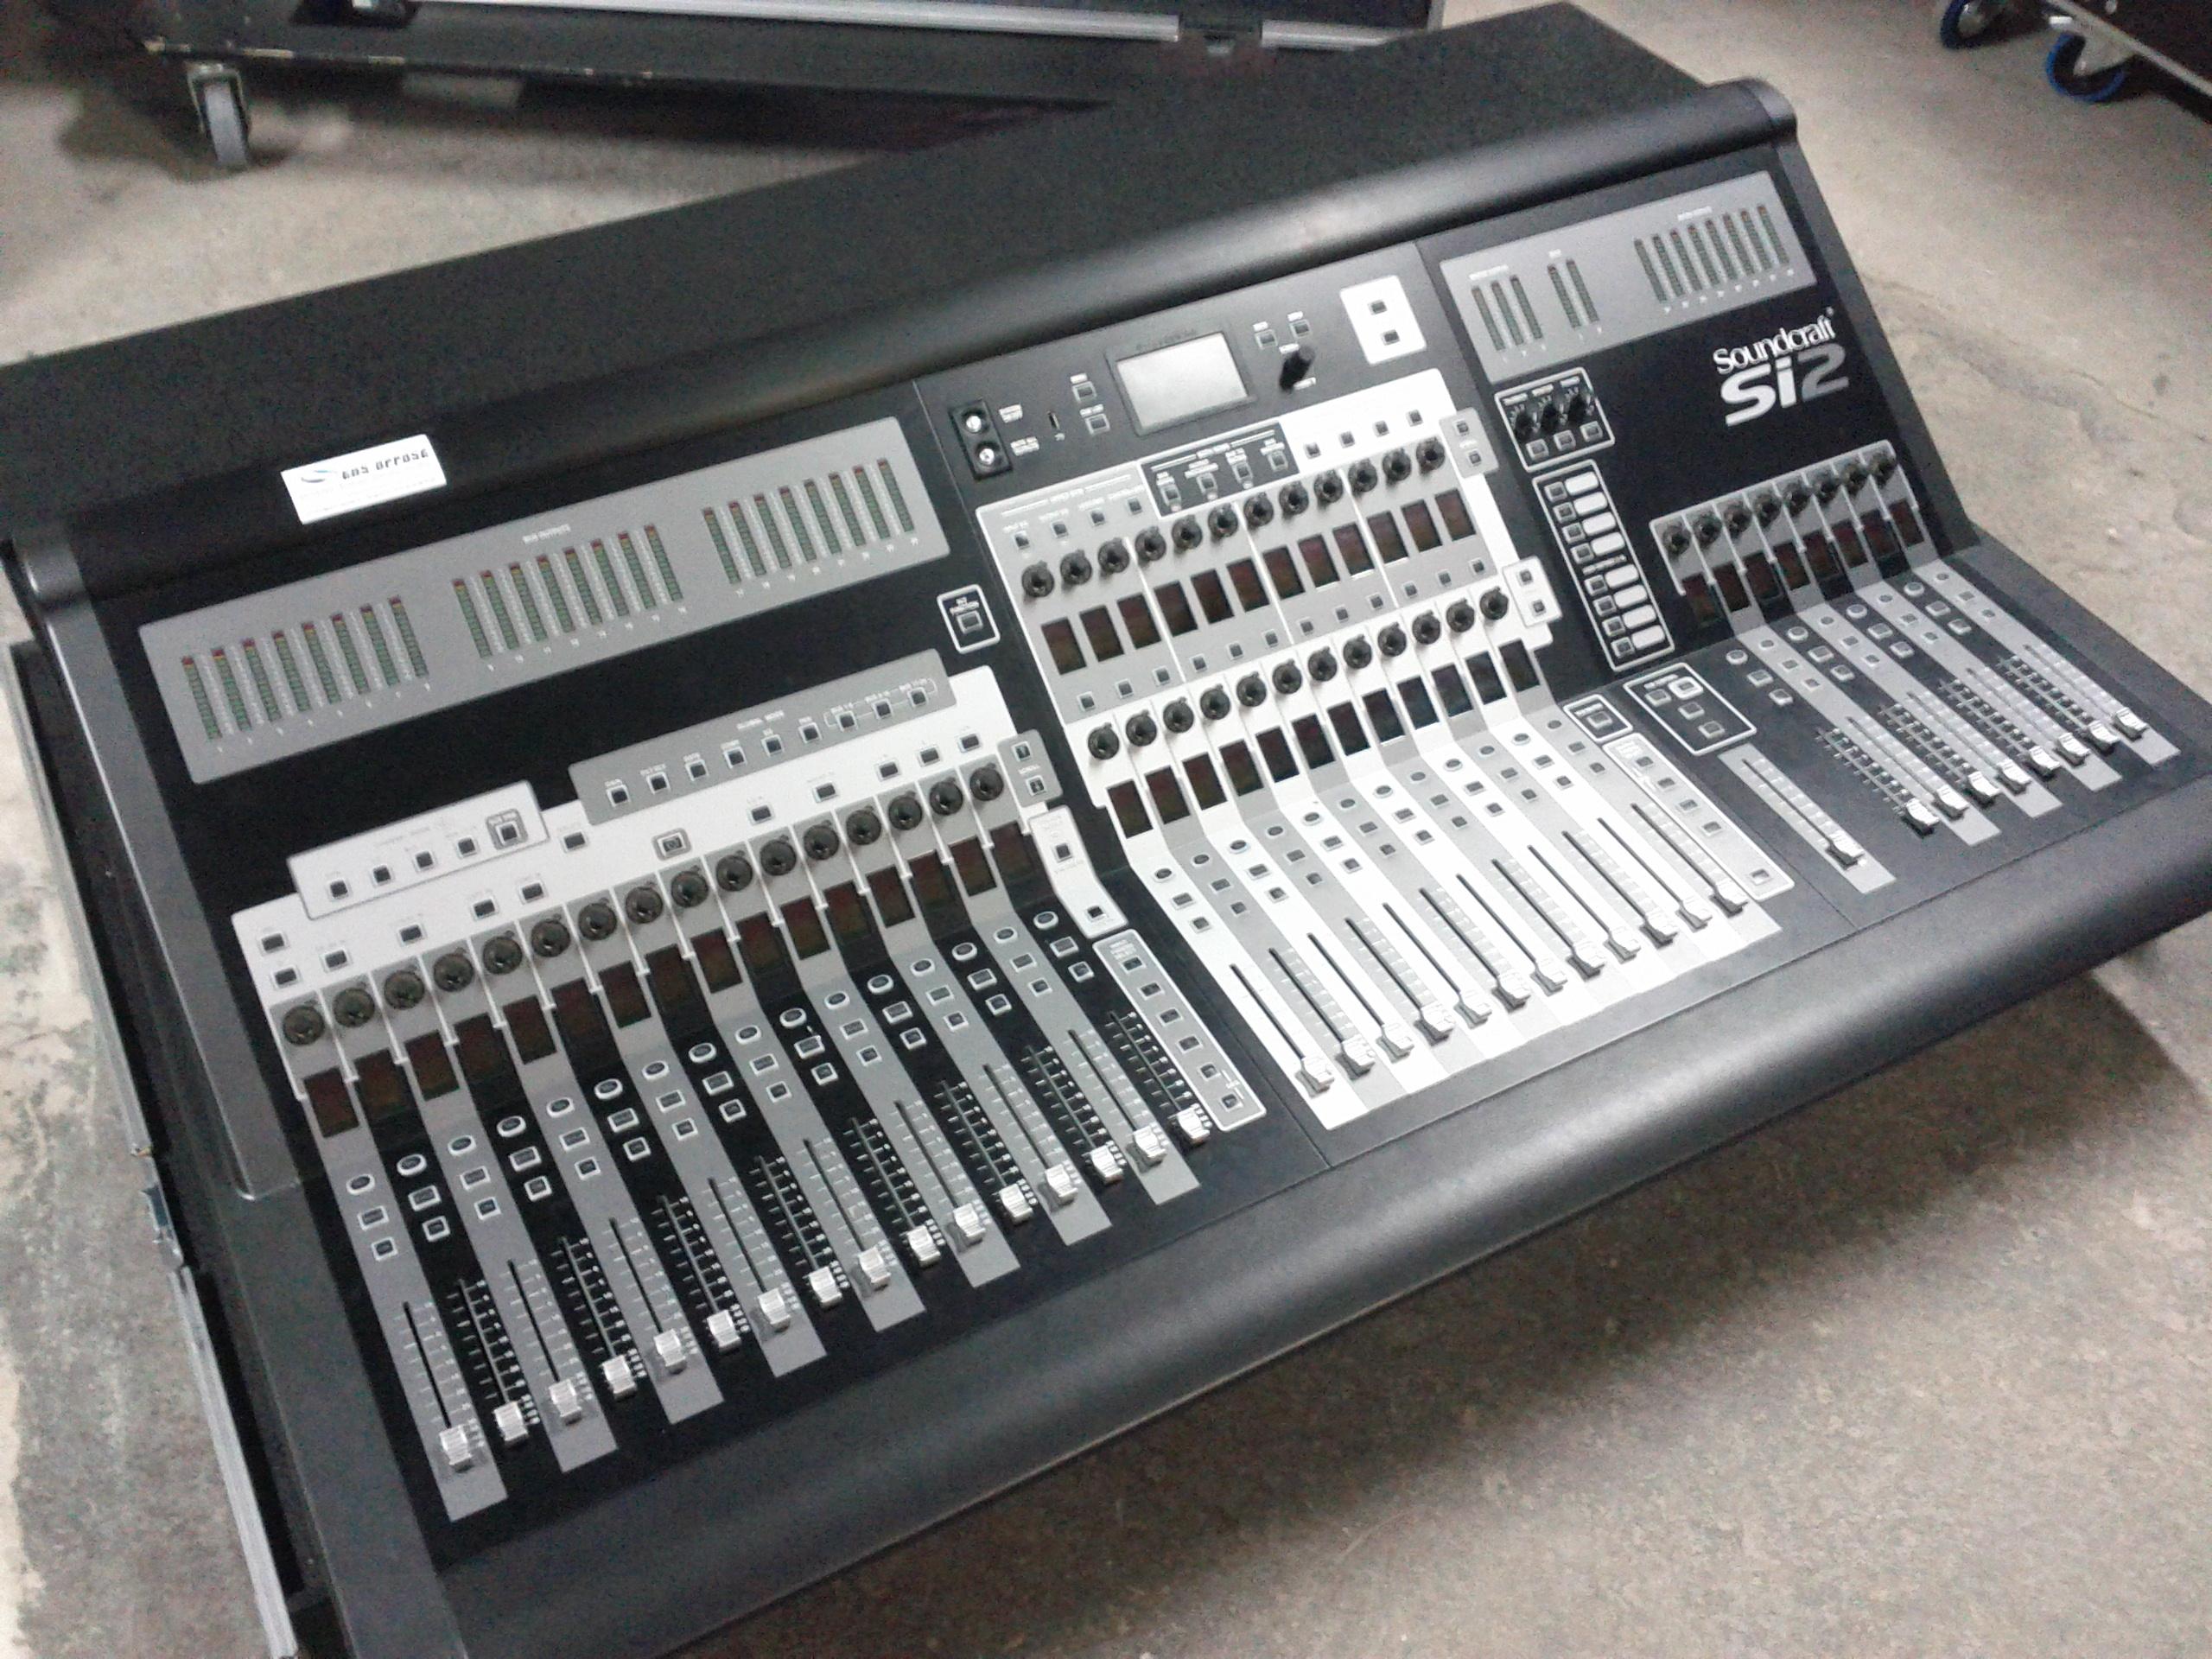 Soundcraft Si3 image (#494857) - Audiofanzine